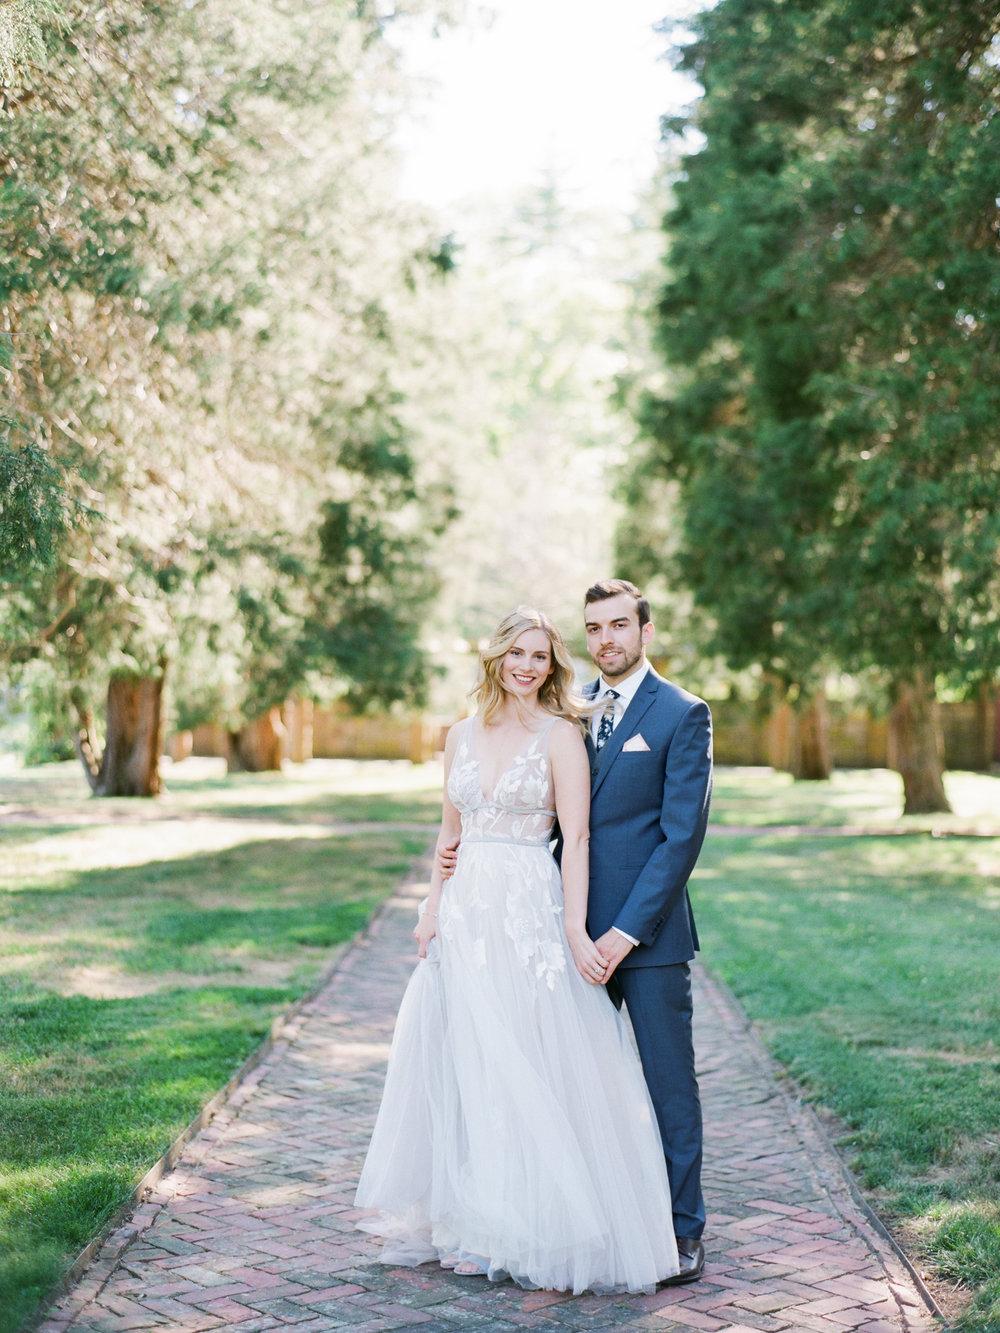 Lenox Estate Wedding in the Berkshires